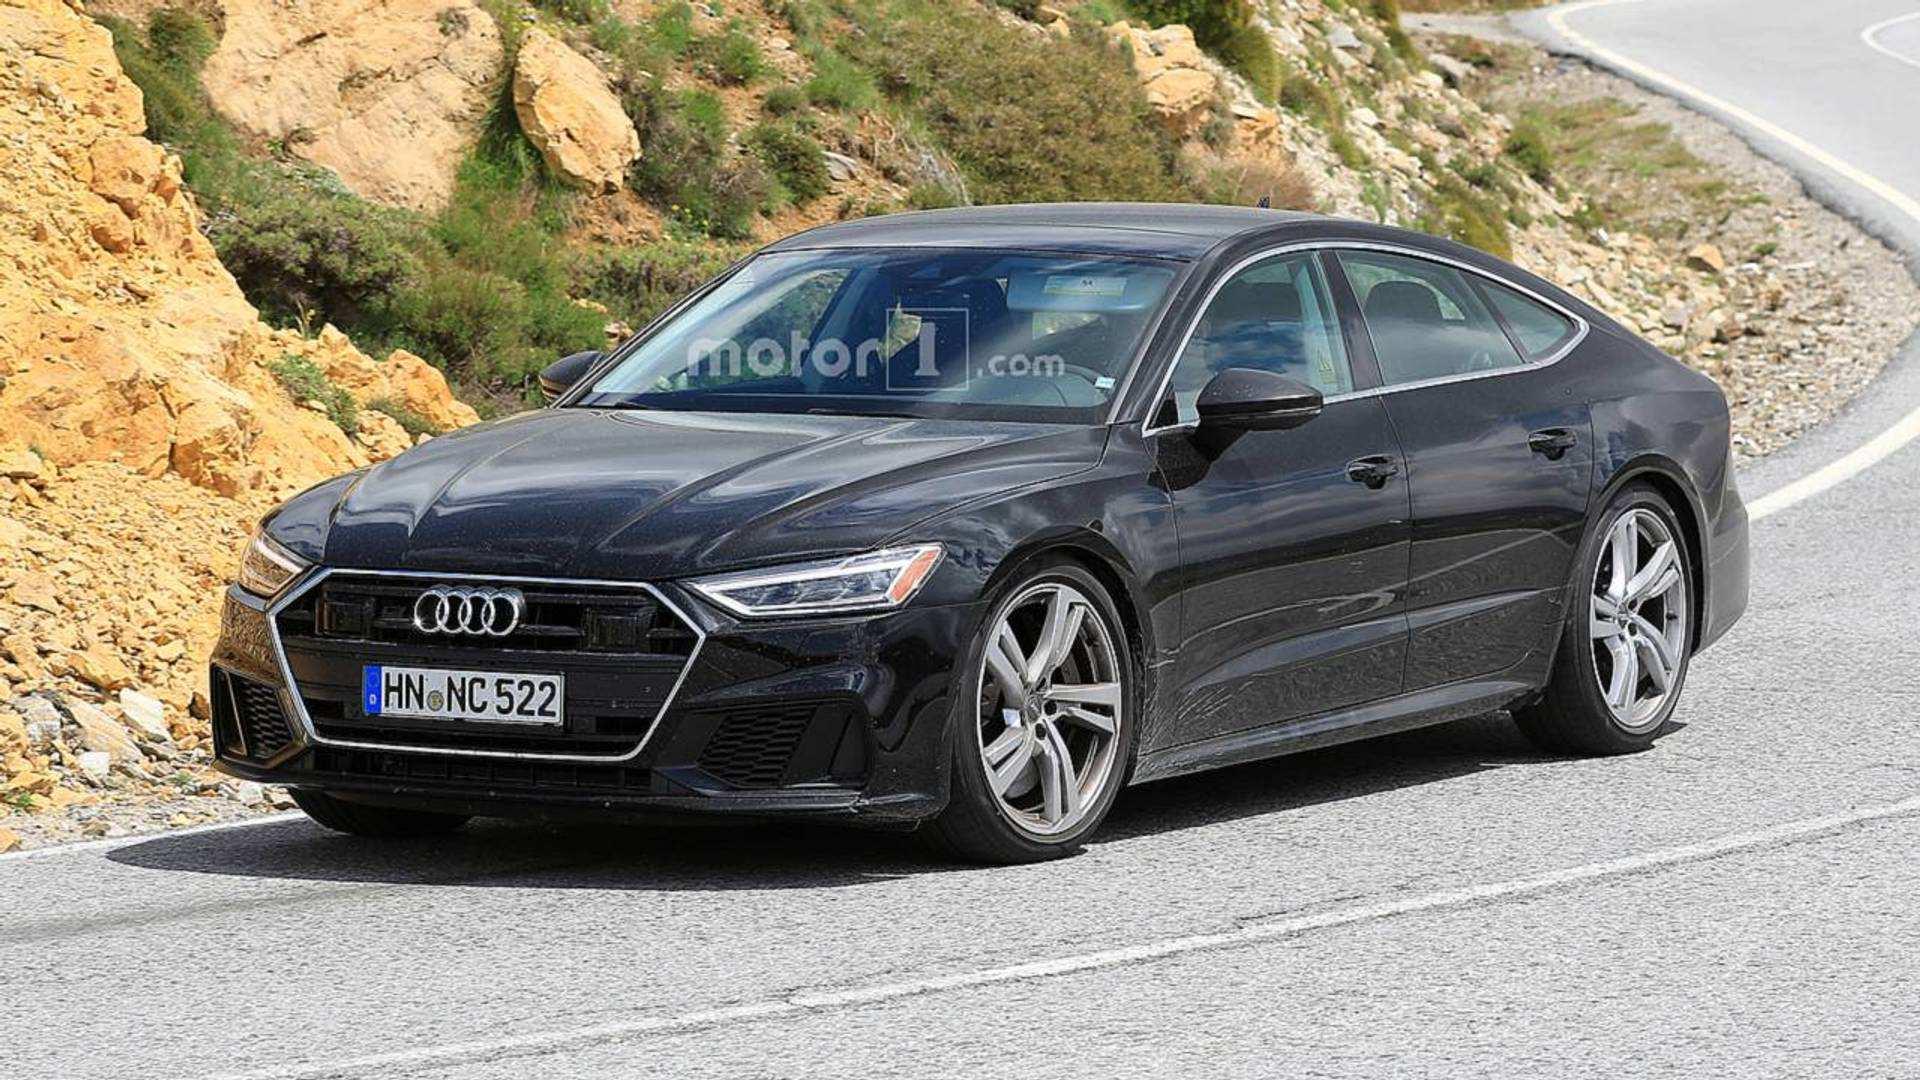 82 Great Audi Modellpalette Bis 2020 Release for Audi Modellpalette Bis 2020